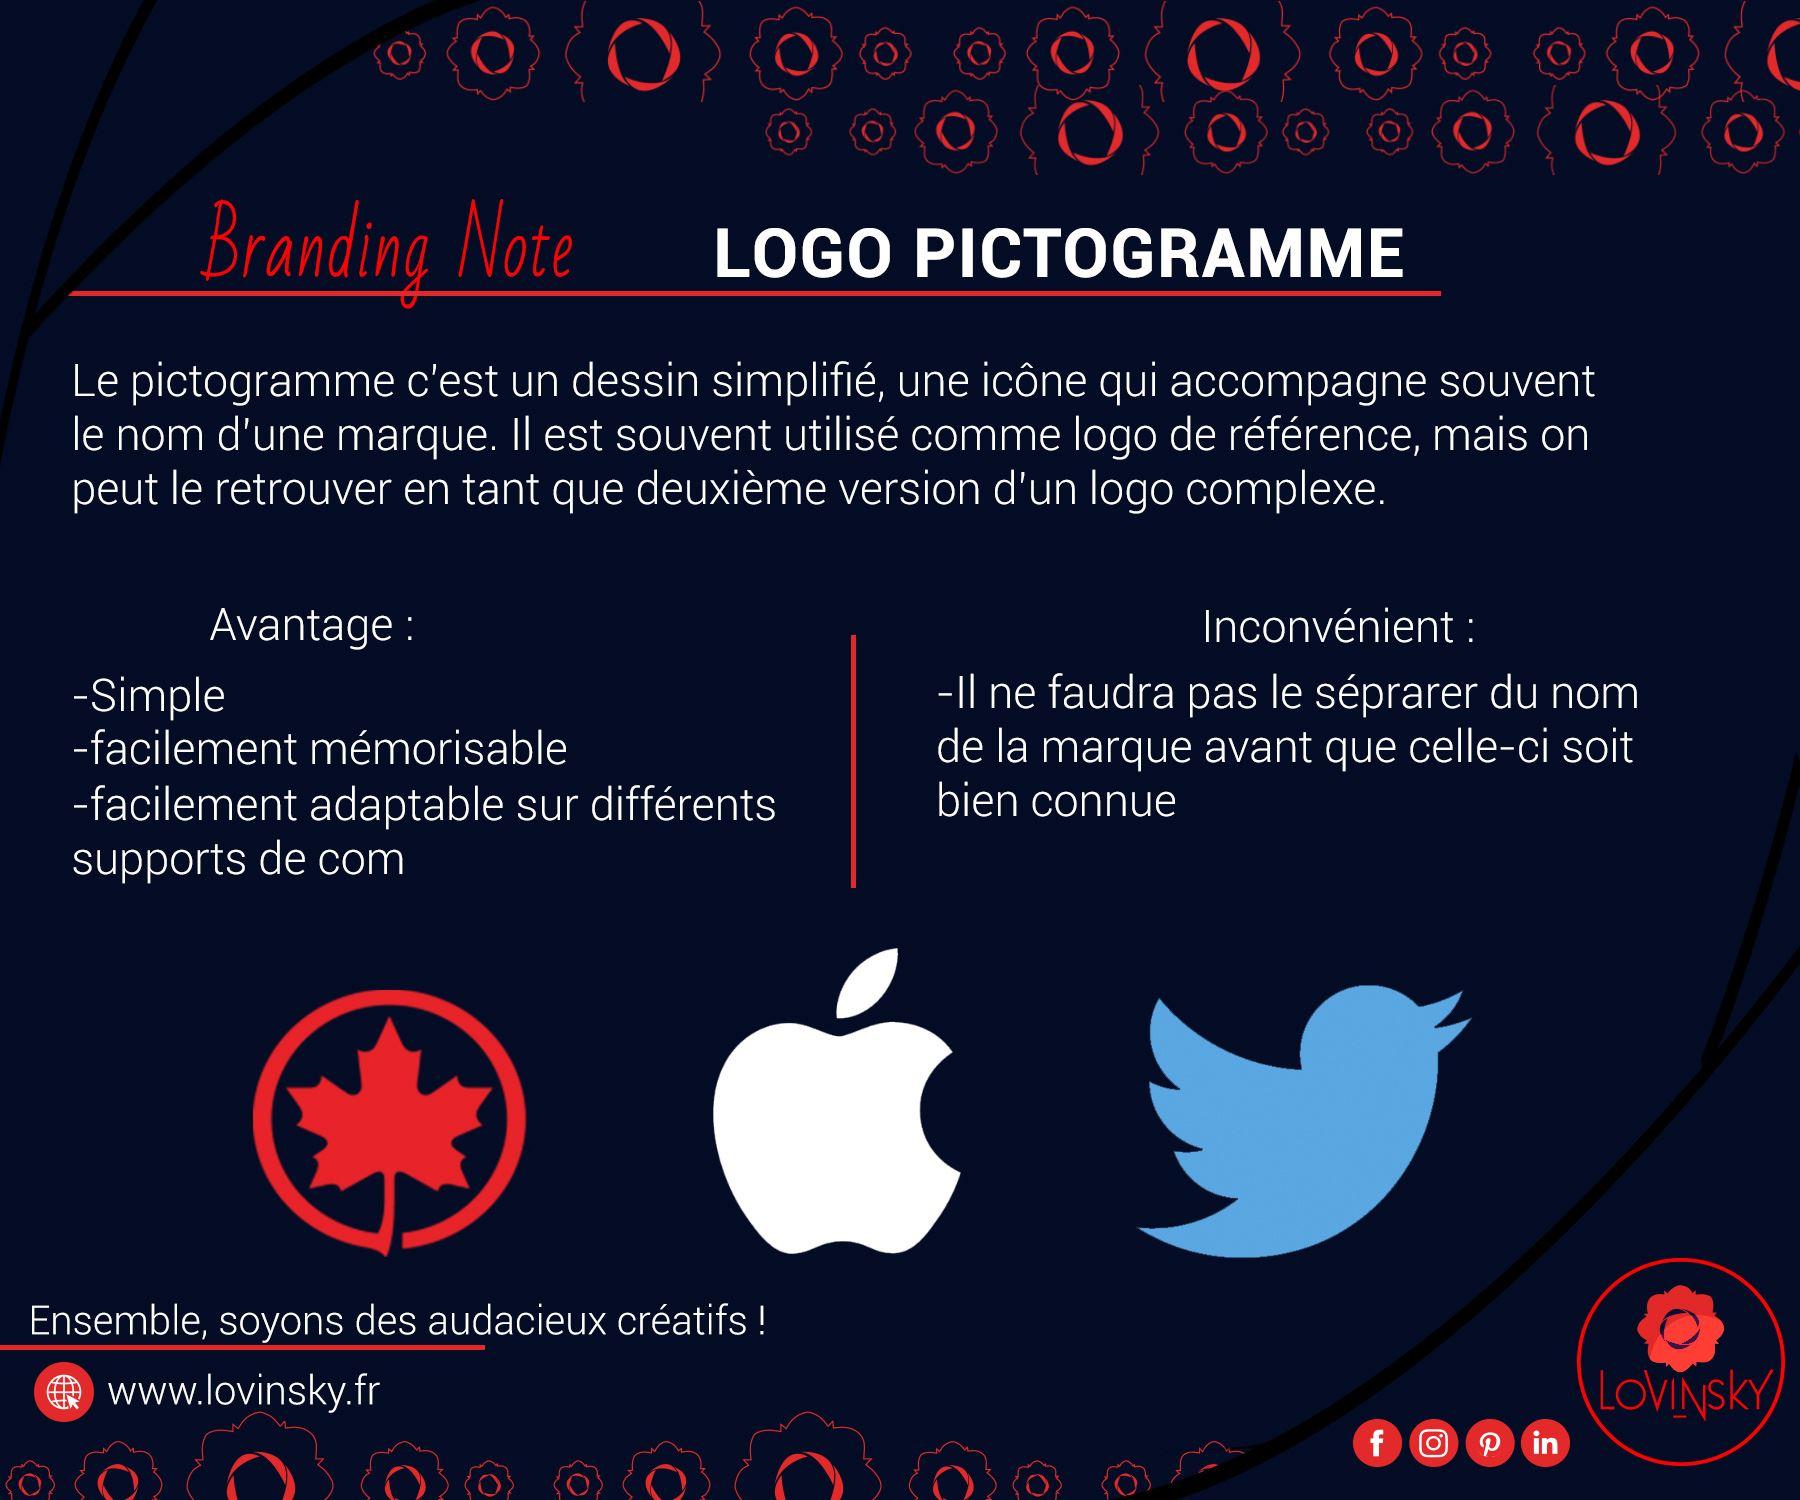 logo-pictogramme lovinsky graphiste webdesigner freelance indépendant nantes 44